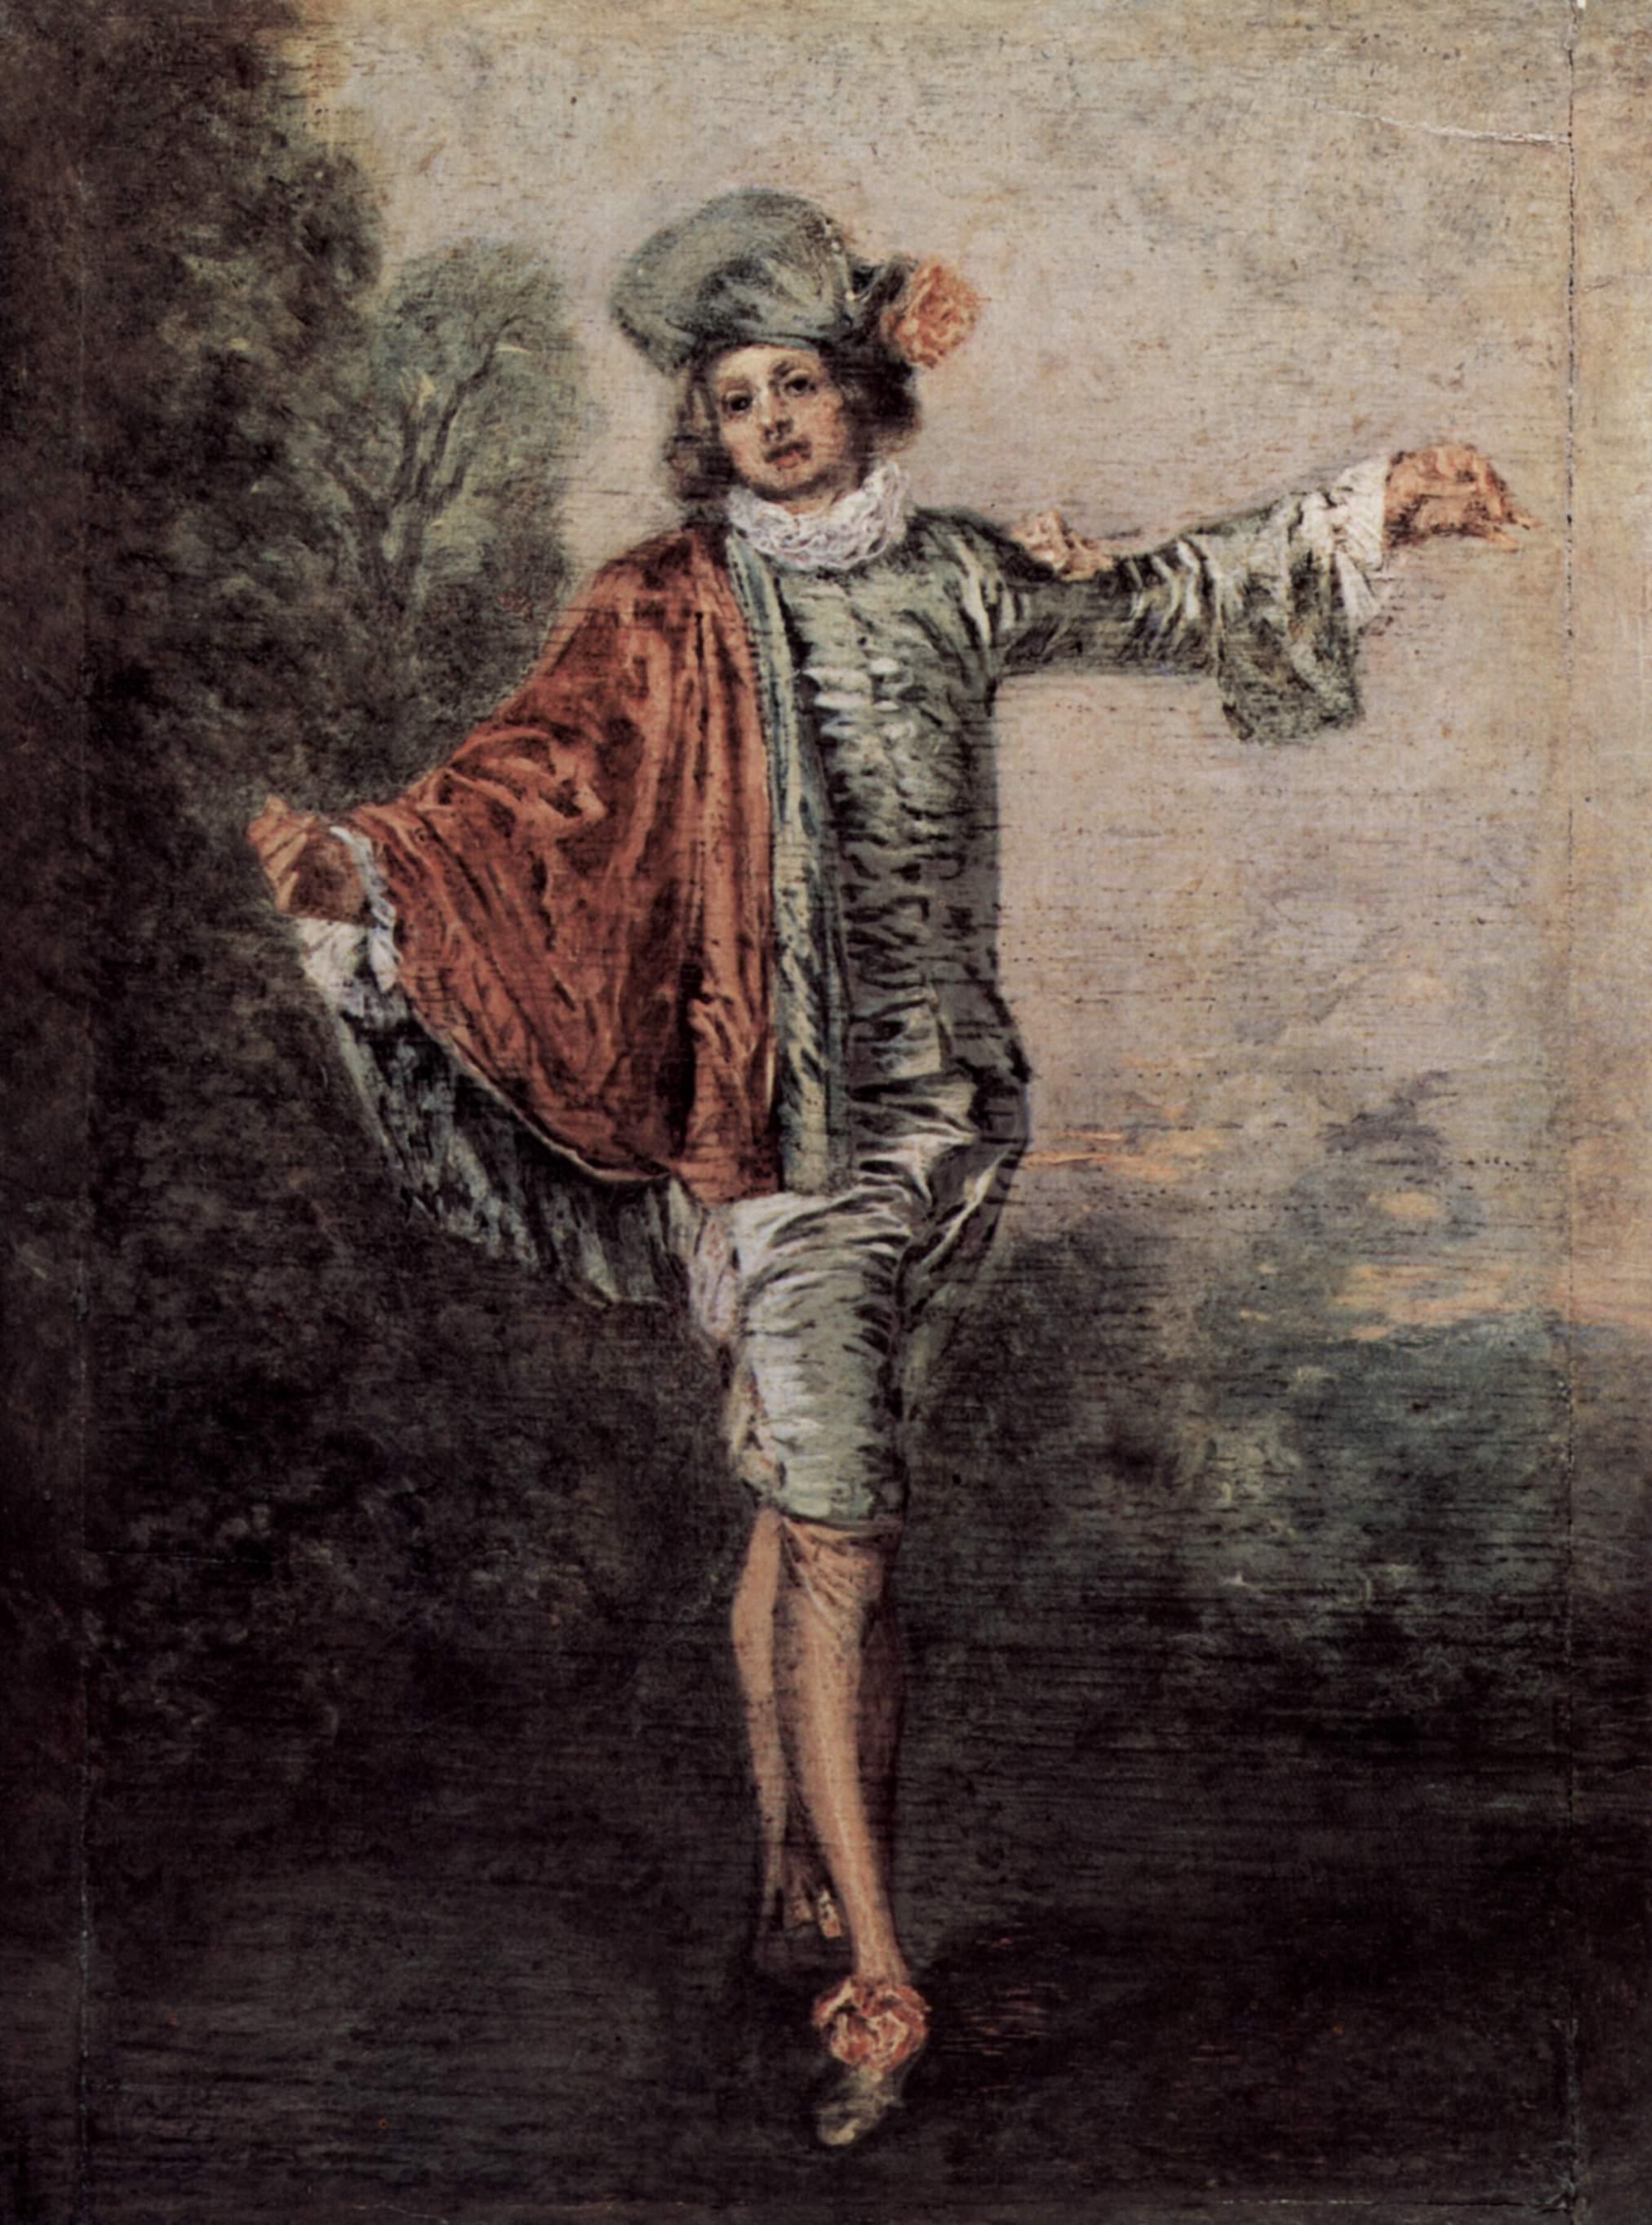 Jean-Antoine_Watteau_1717_L'indifferent